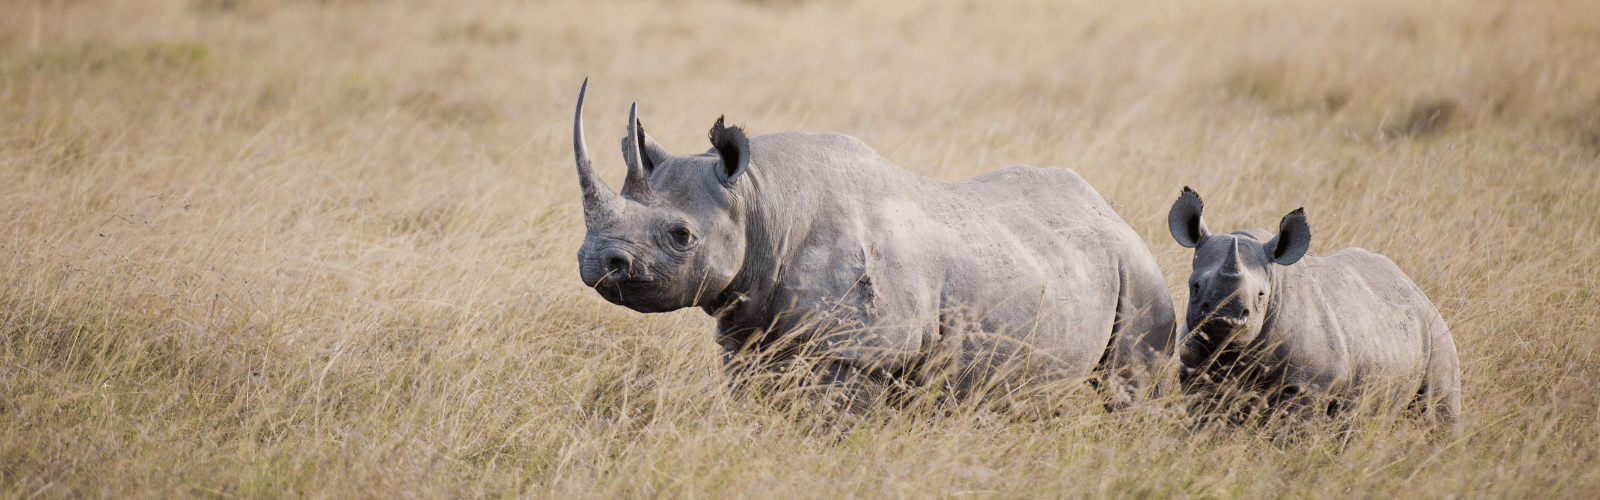 Value rhino horns Rhino Horns